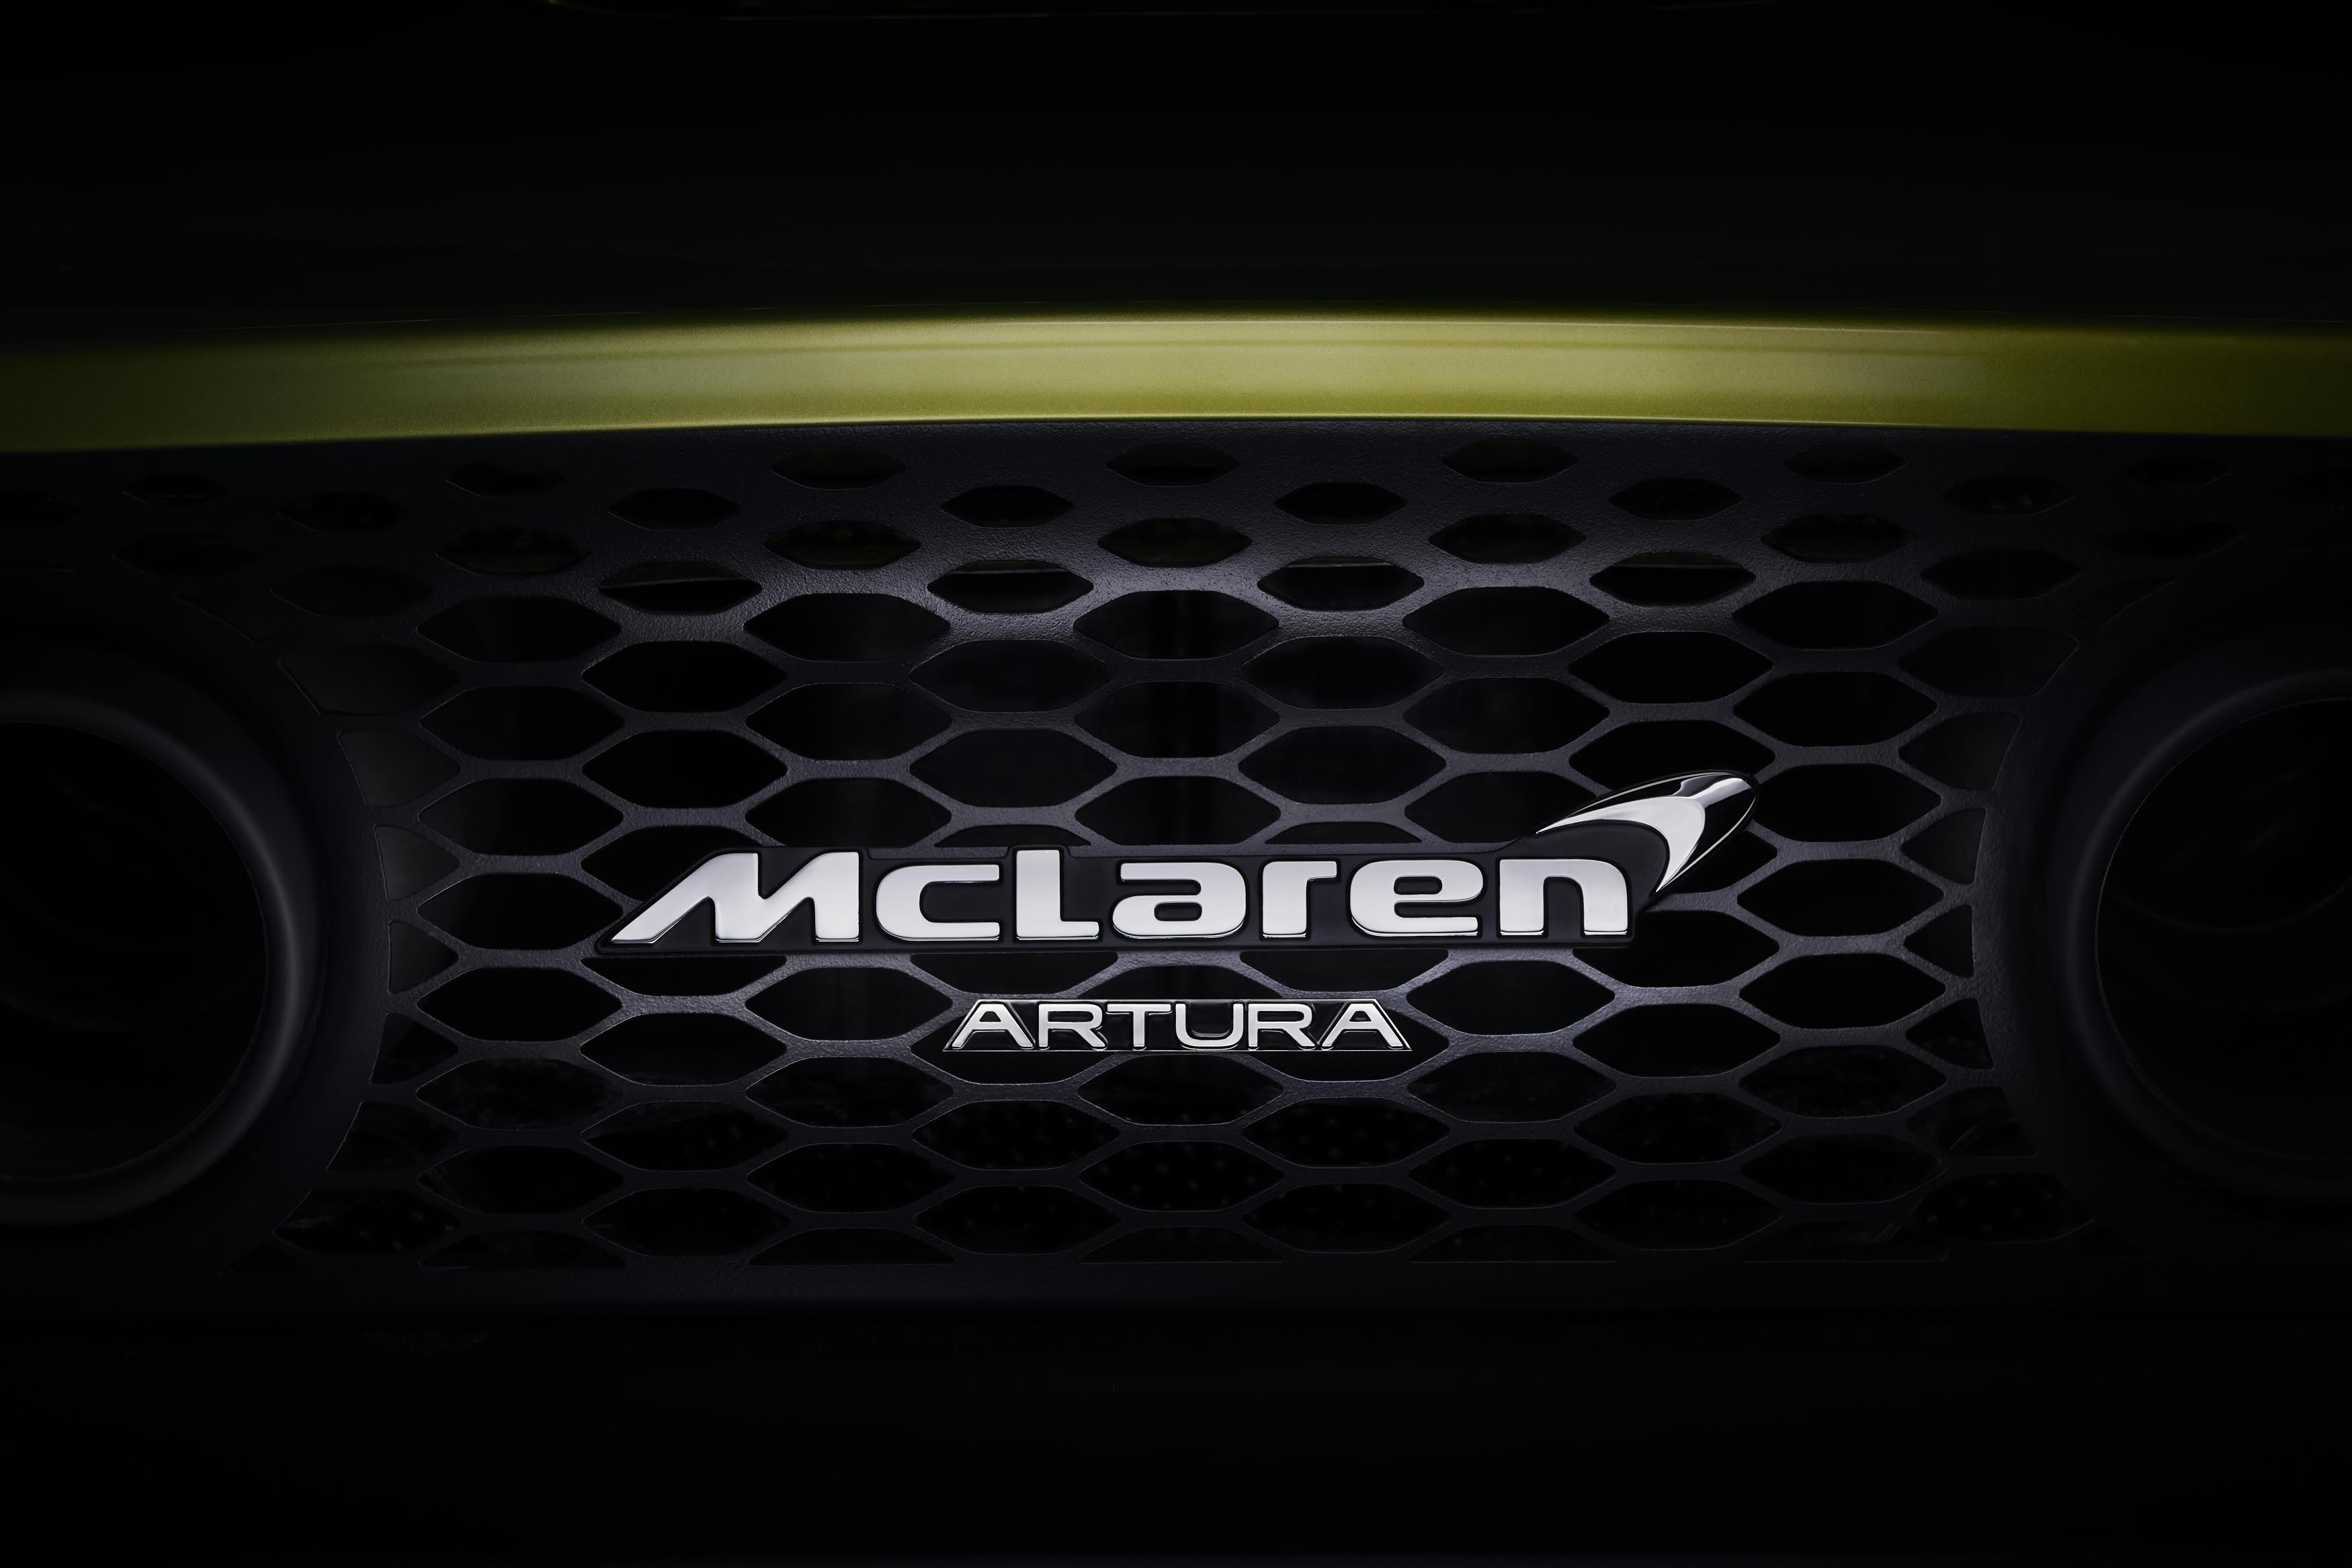 McLaren's Artura kicks off production hybrid push